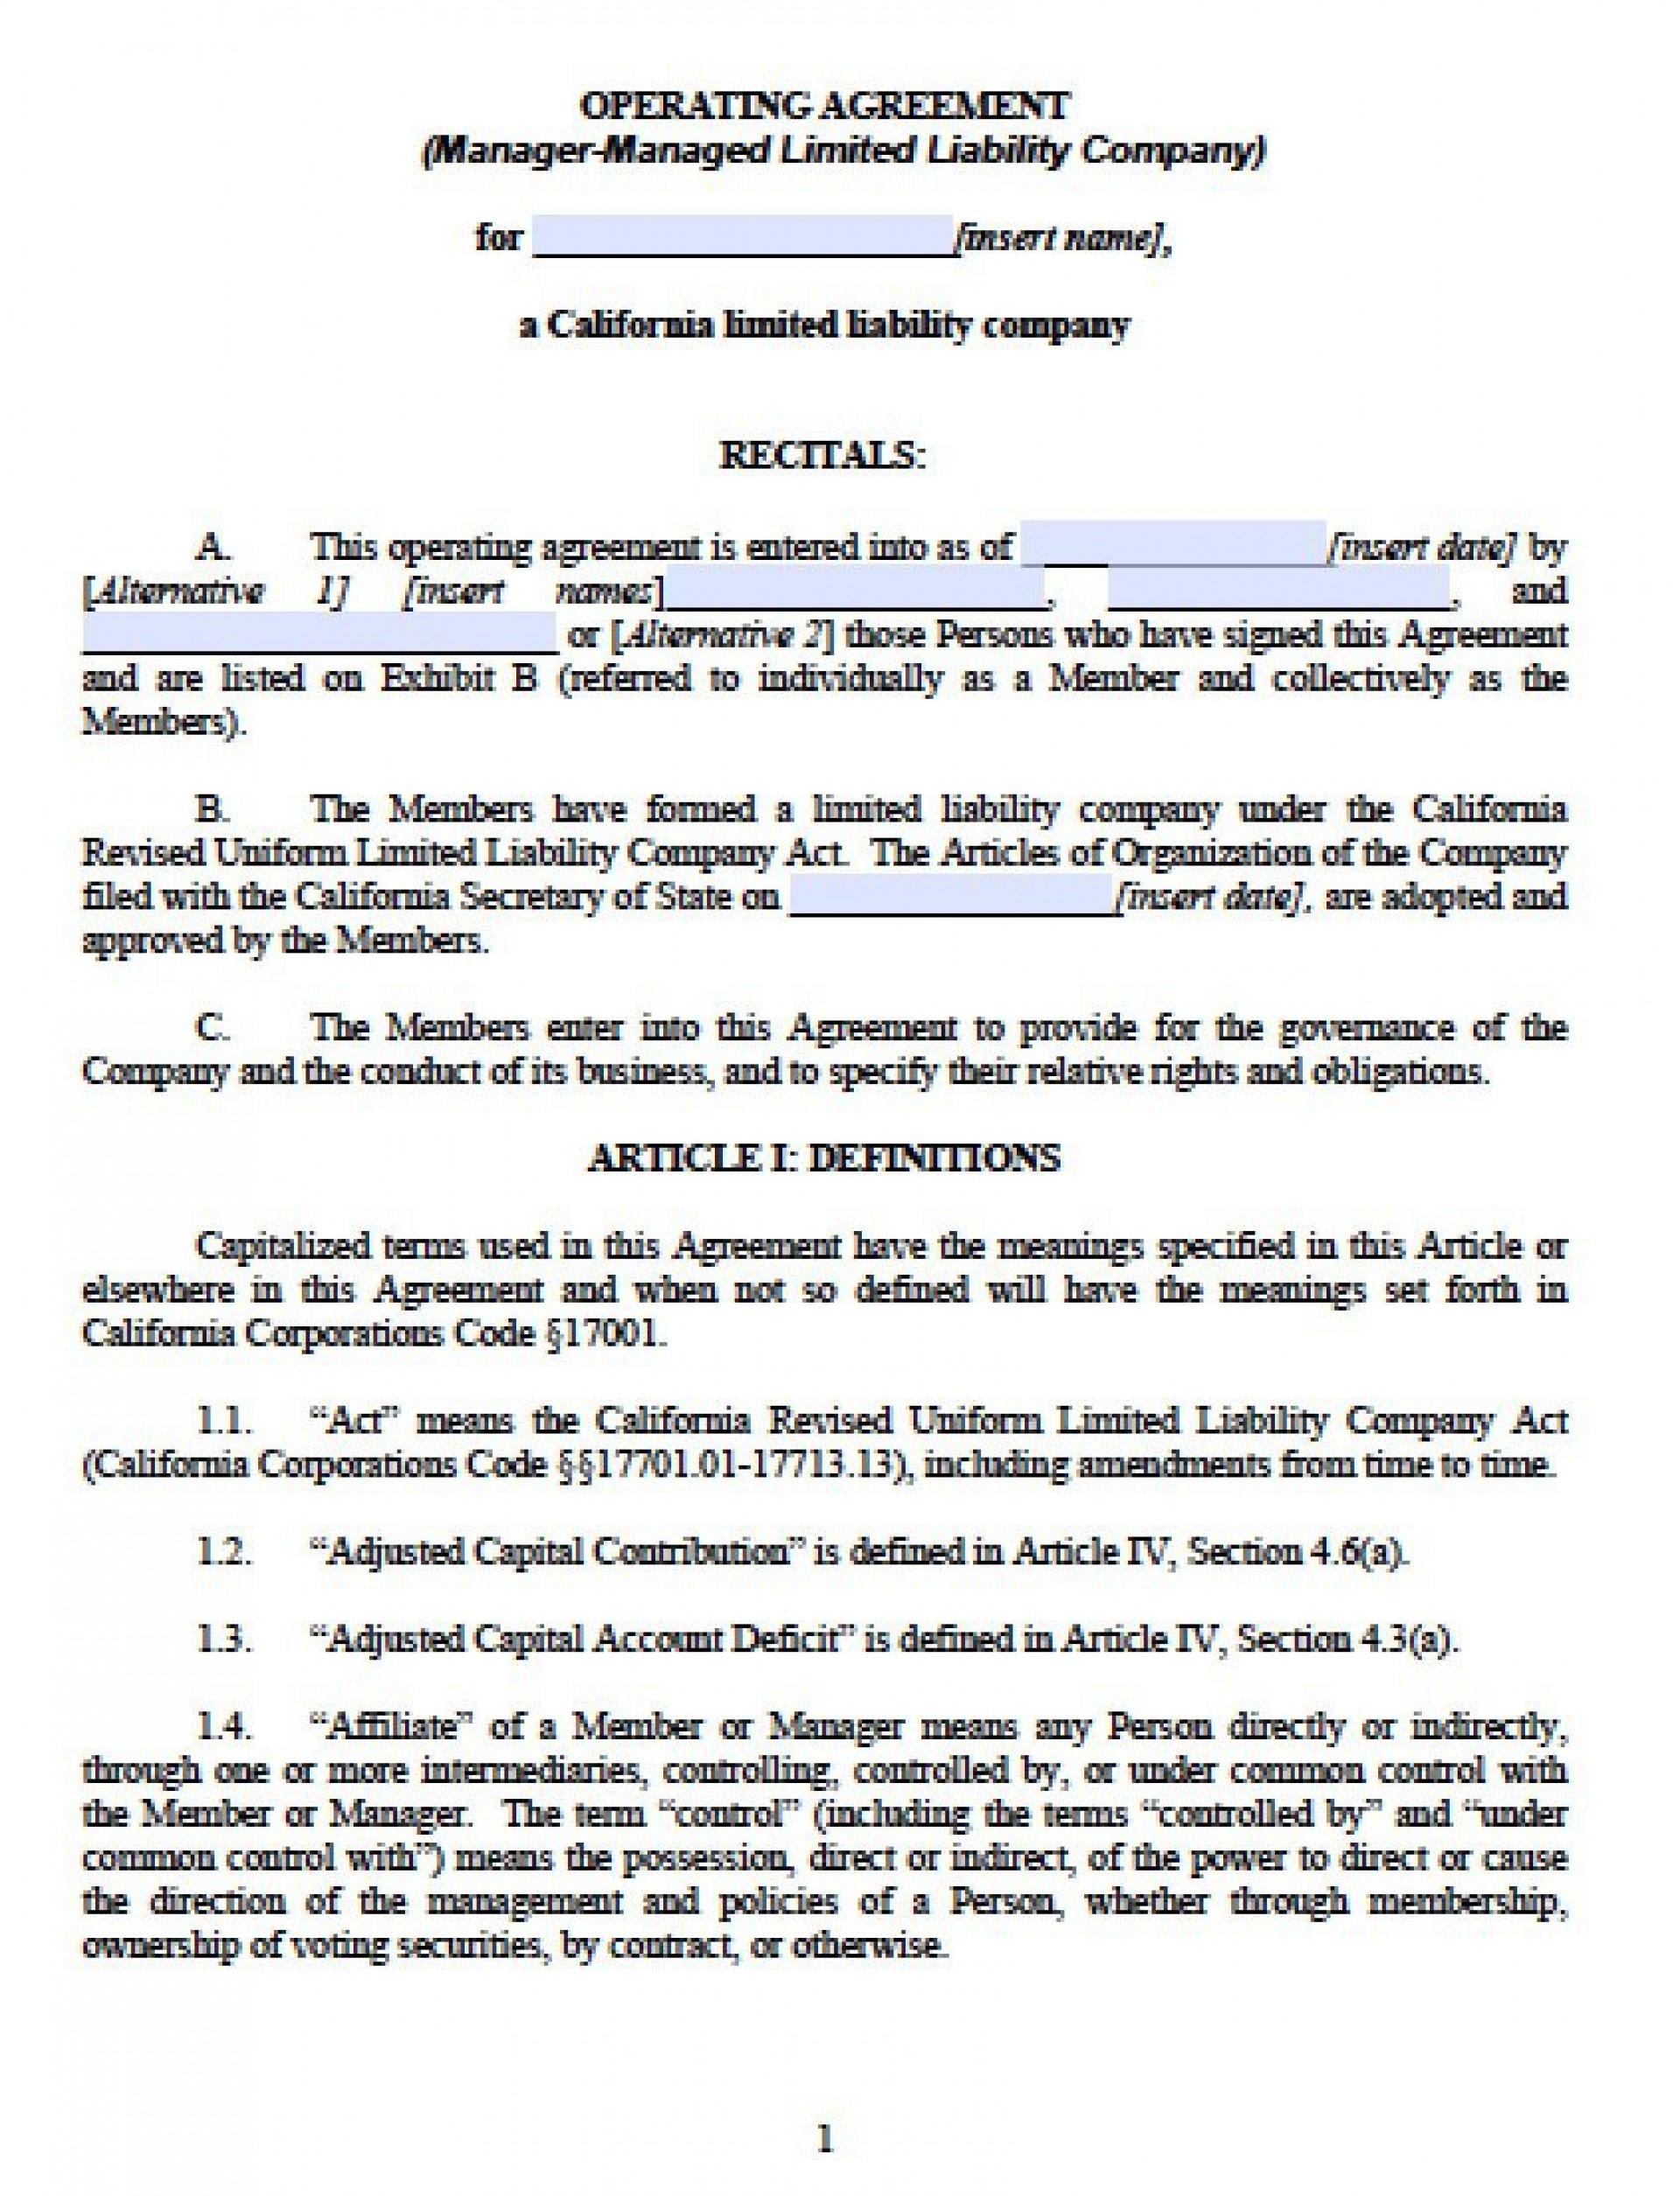 002 Unique Operation Agreement Llc Template Design  Operating Florida Indiana Single Member California1920